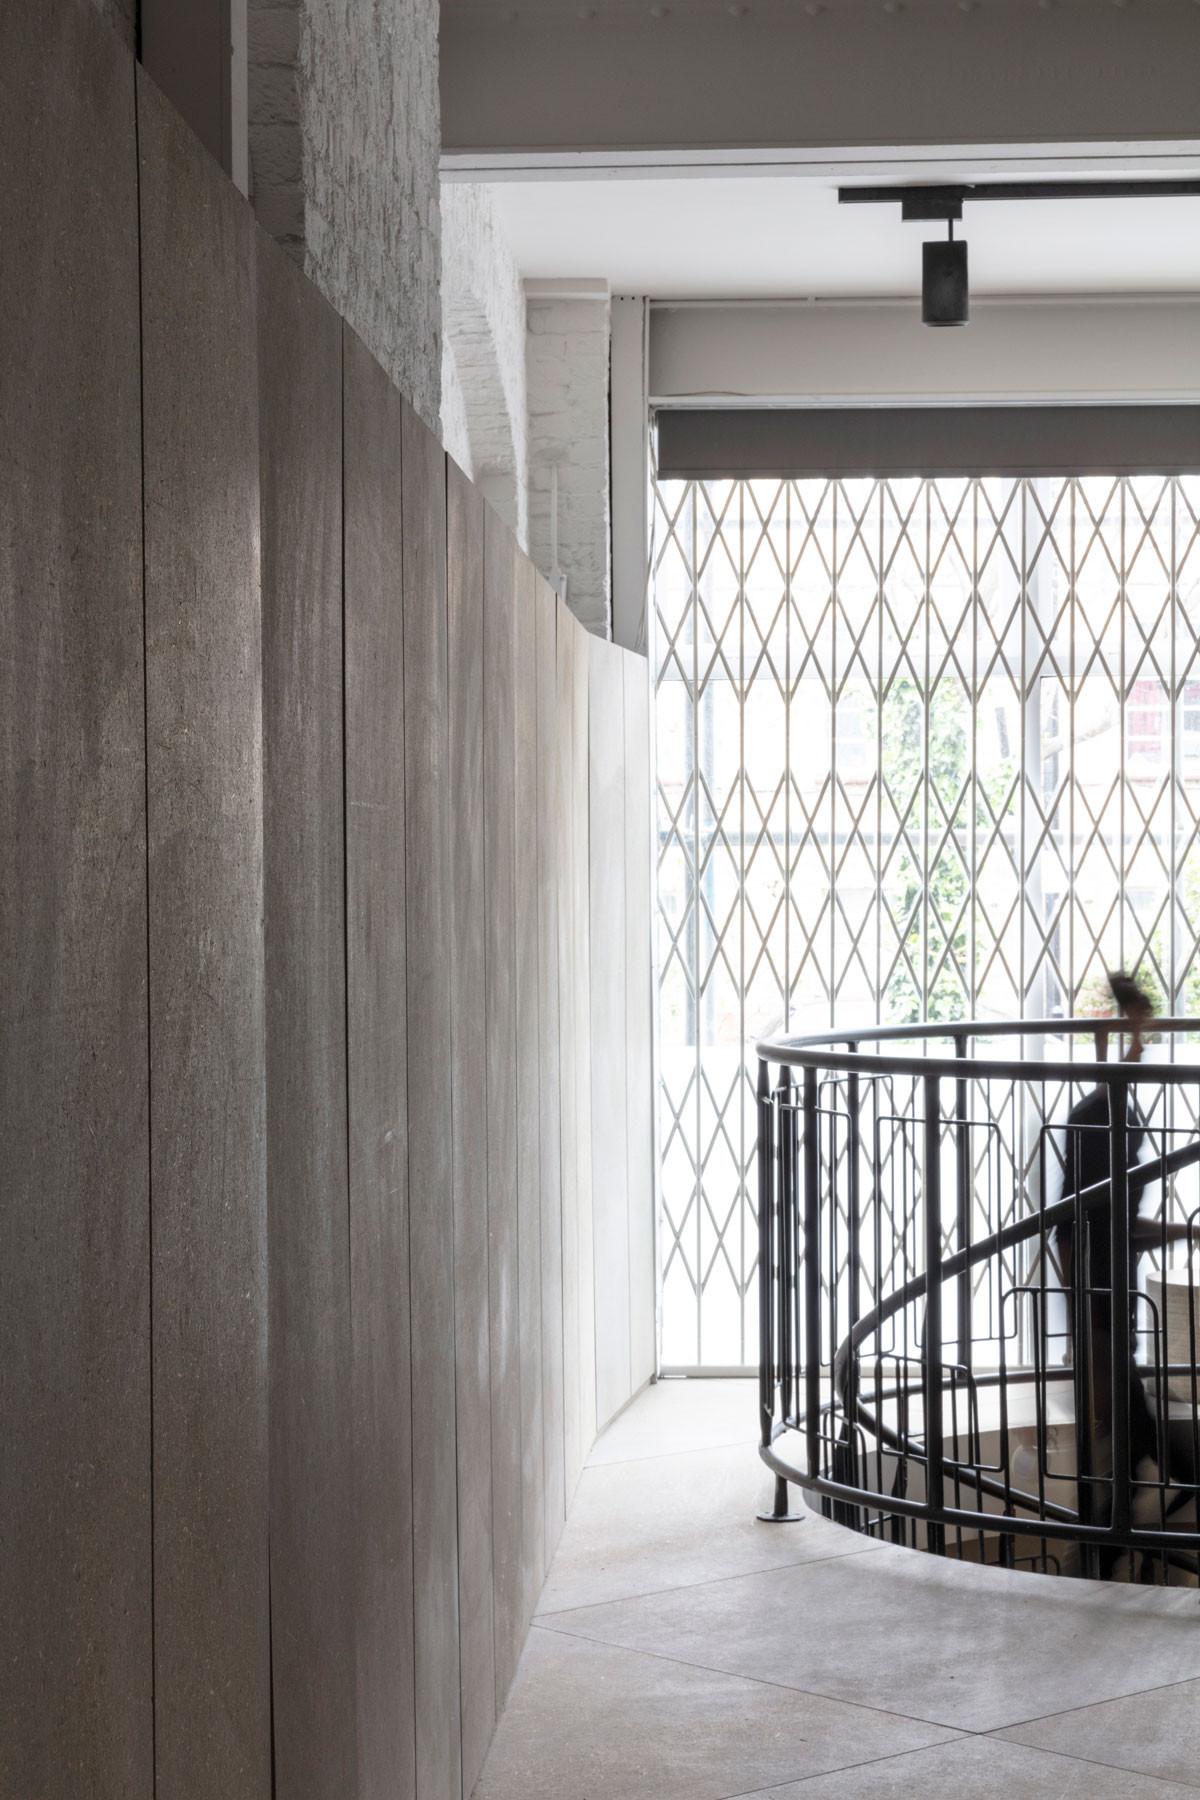 showroom interior design architect London